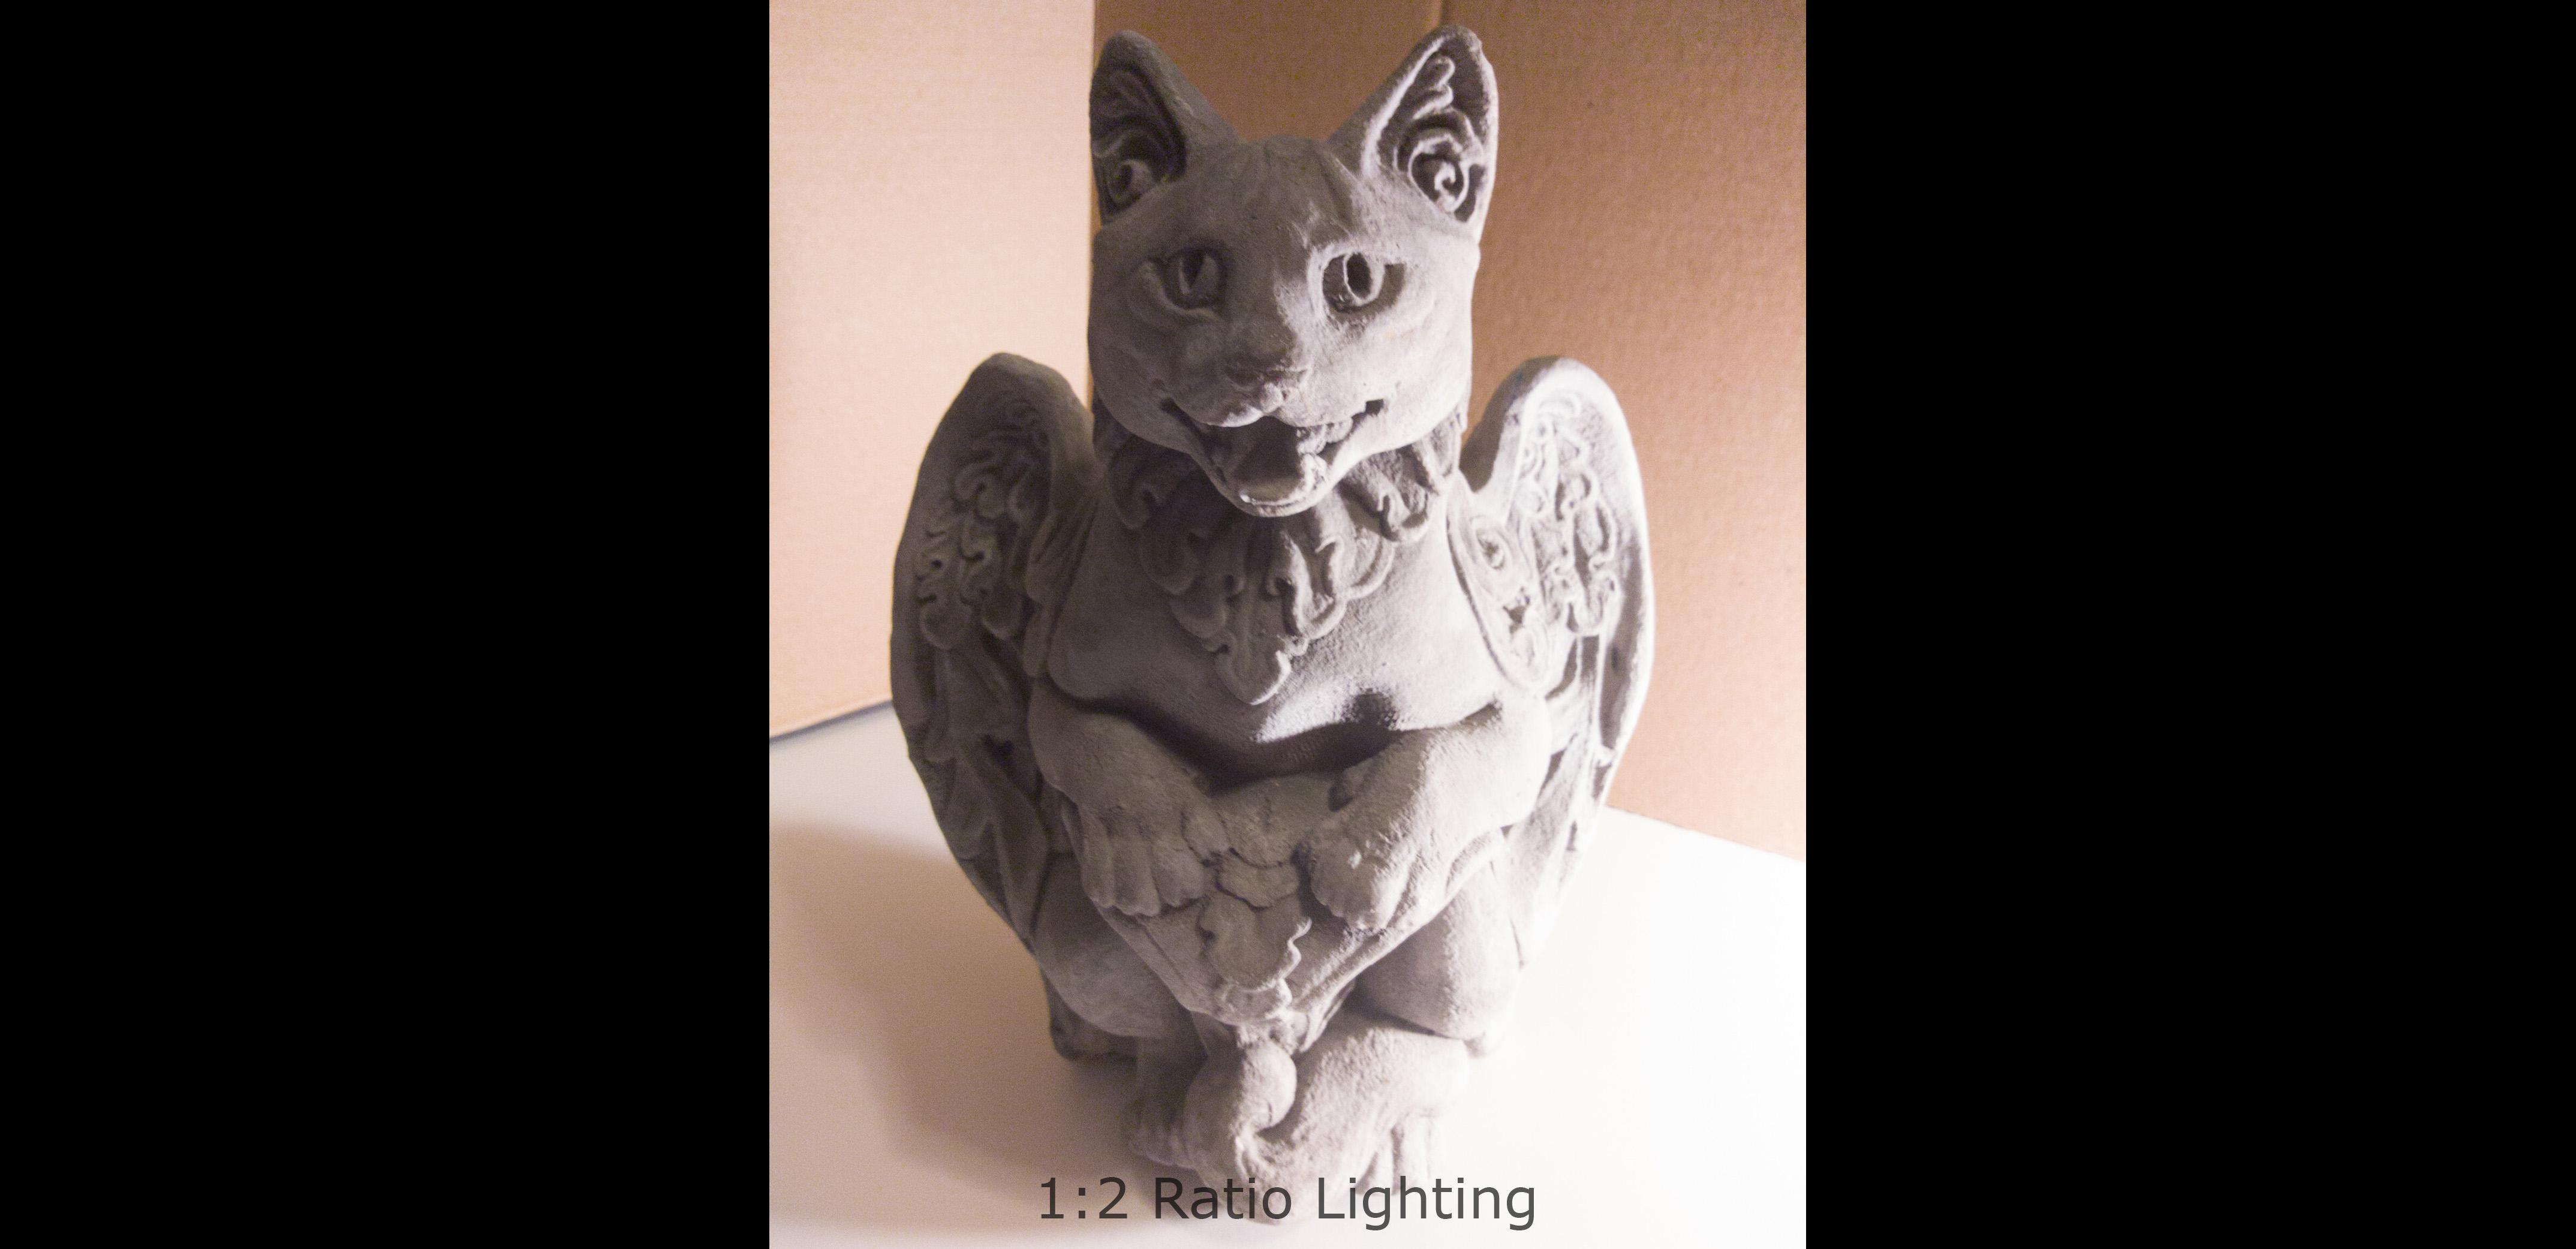 1:2 Ratio Lighting